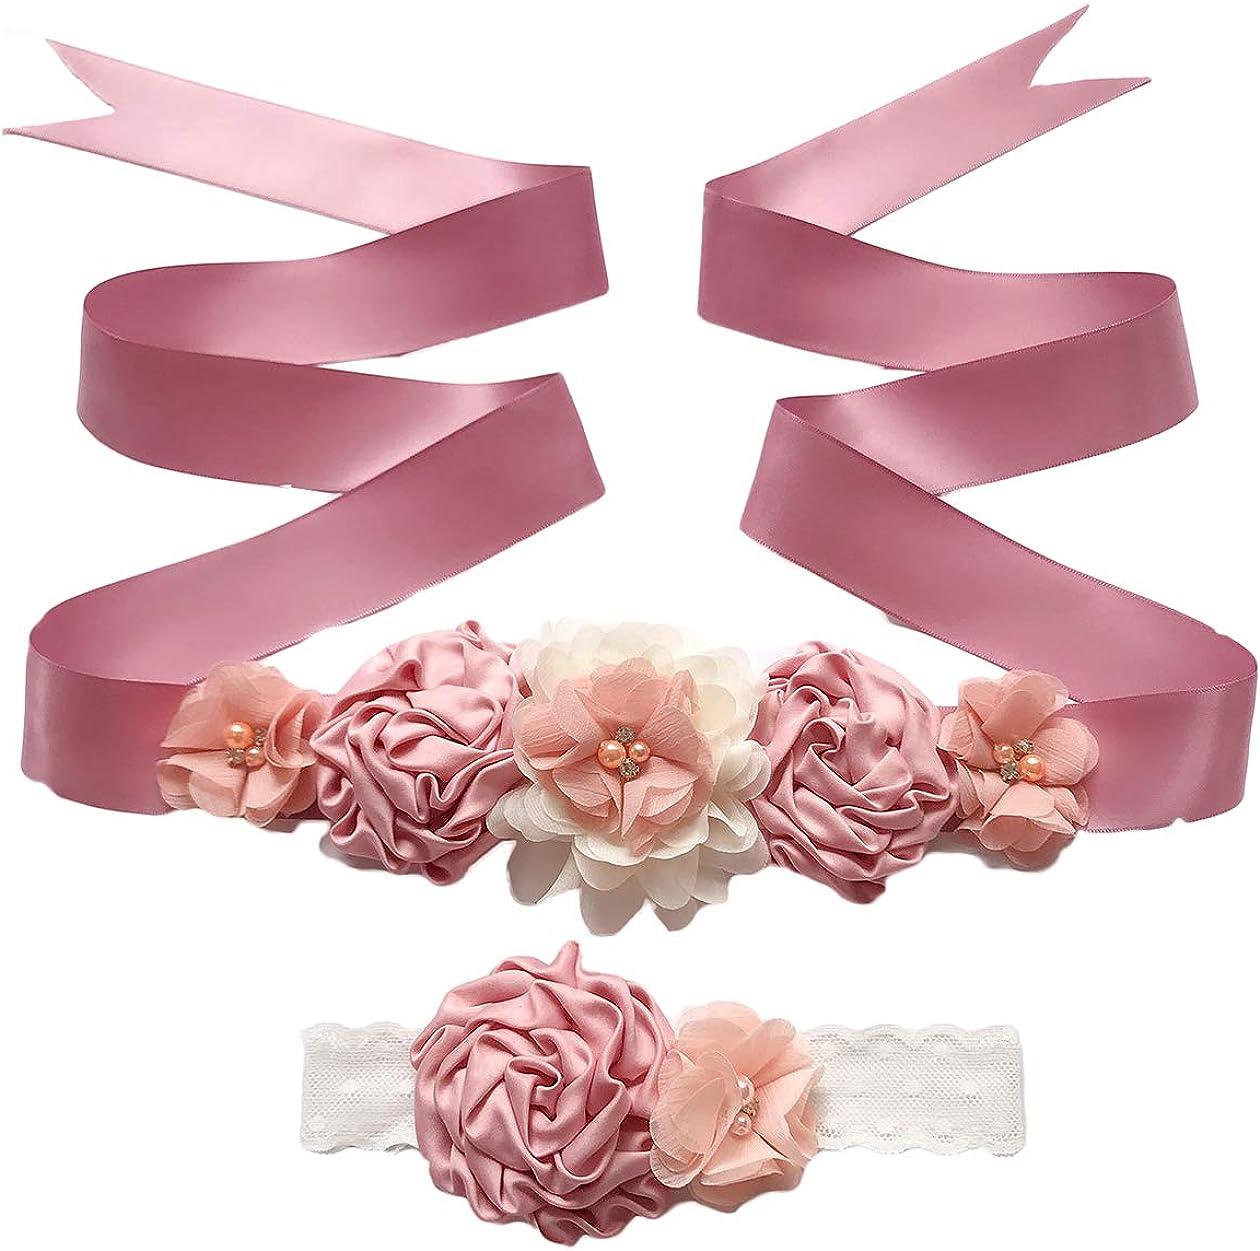 Maternity Flower Sash Belt Flower Girls Dress Belt Bridal Floral Pregnant Sash JB29